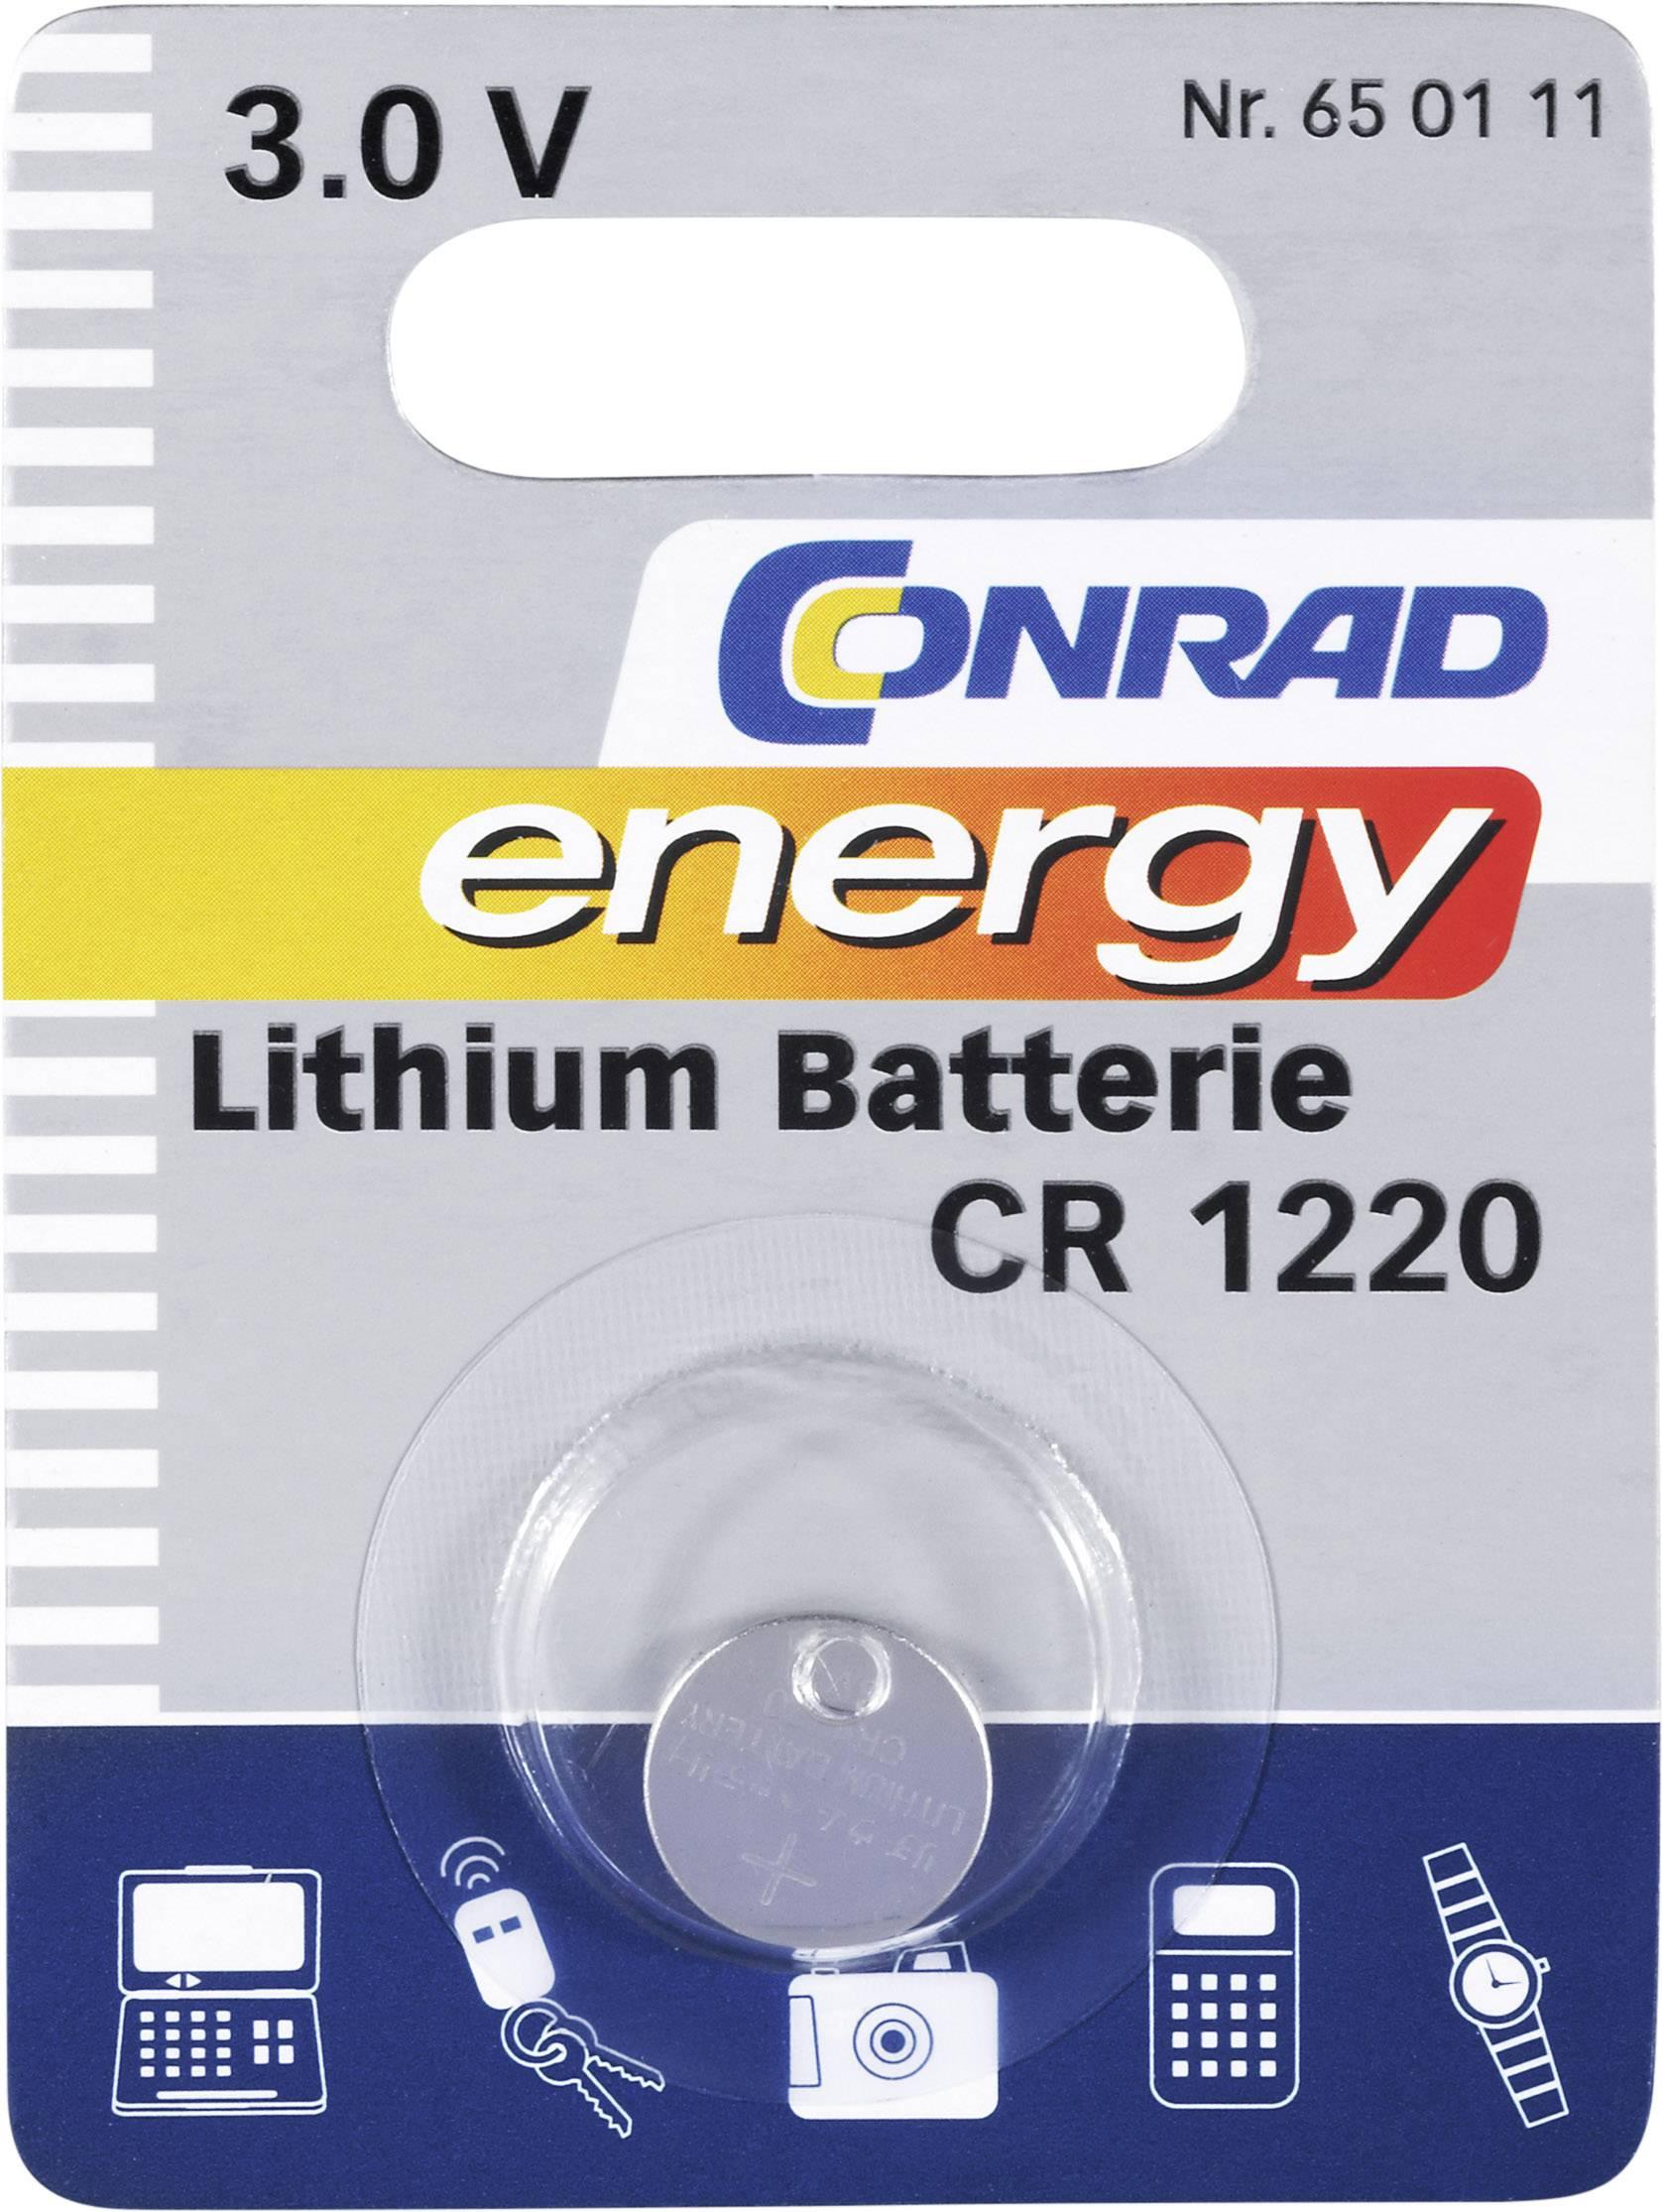 Lítiové gombíkové batérie CR1220